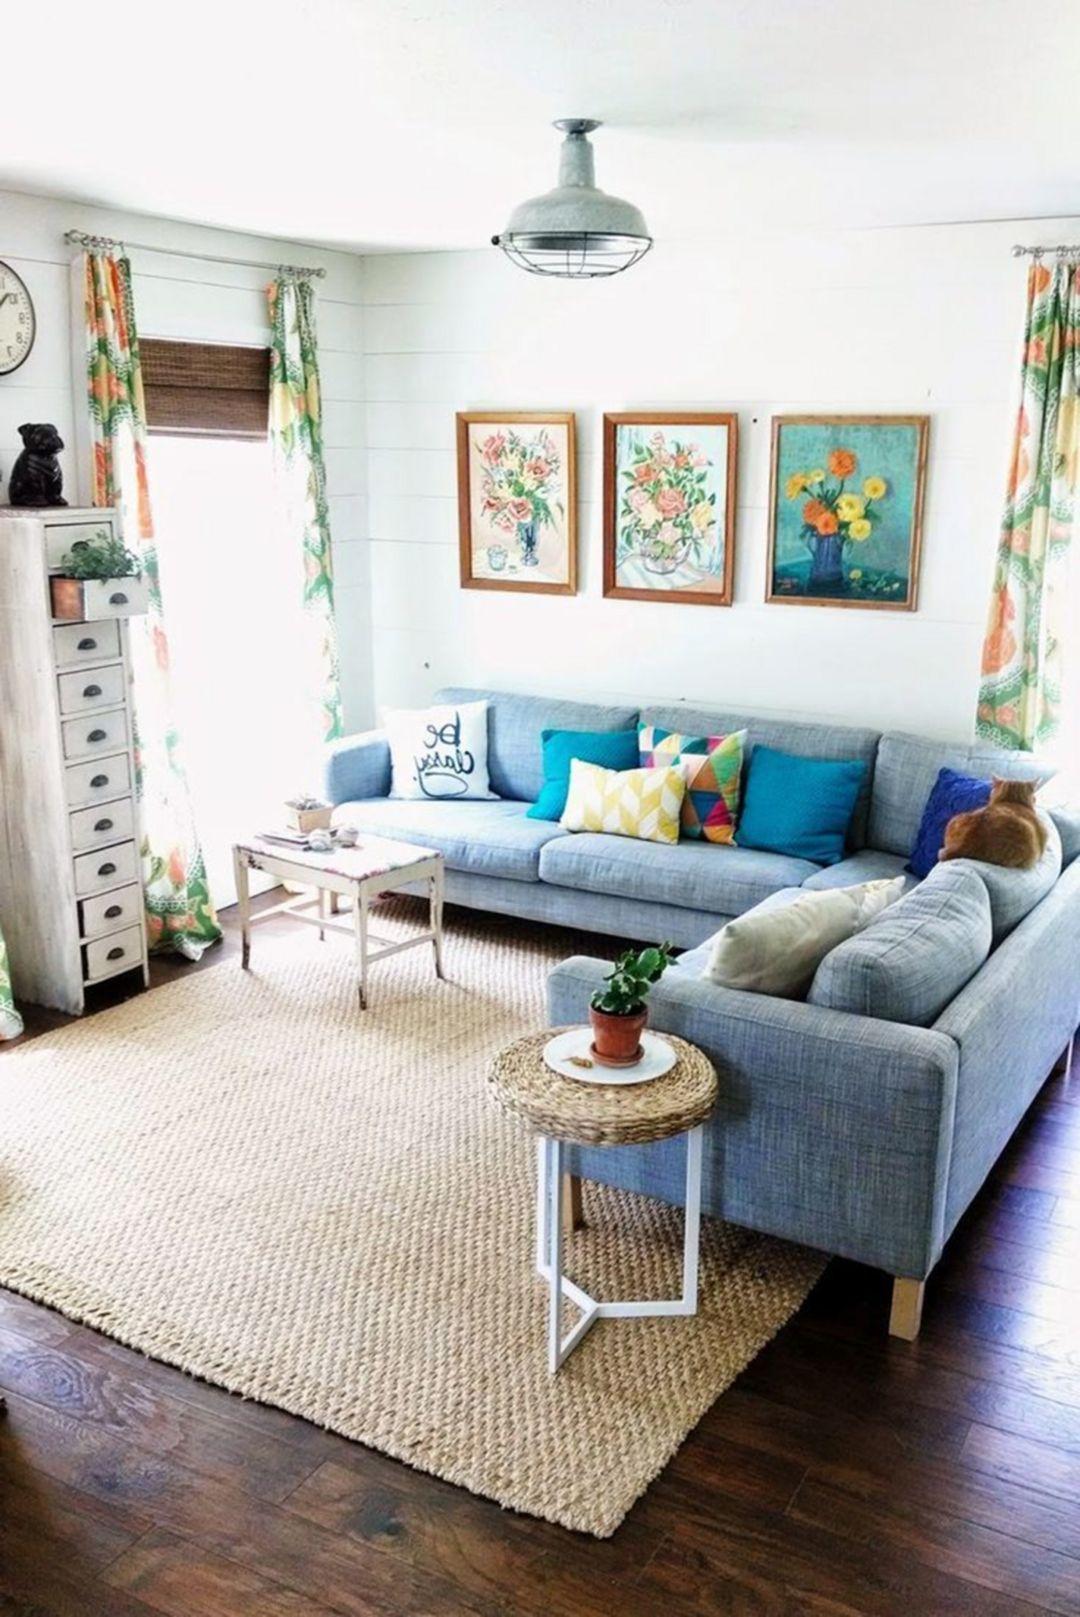 15 Impressive Apartment Living Room Decorating Ideas On A ...